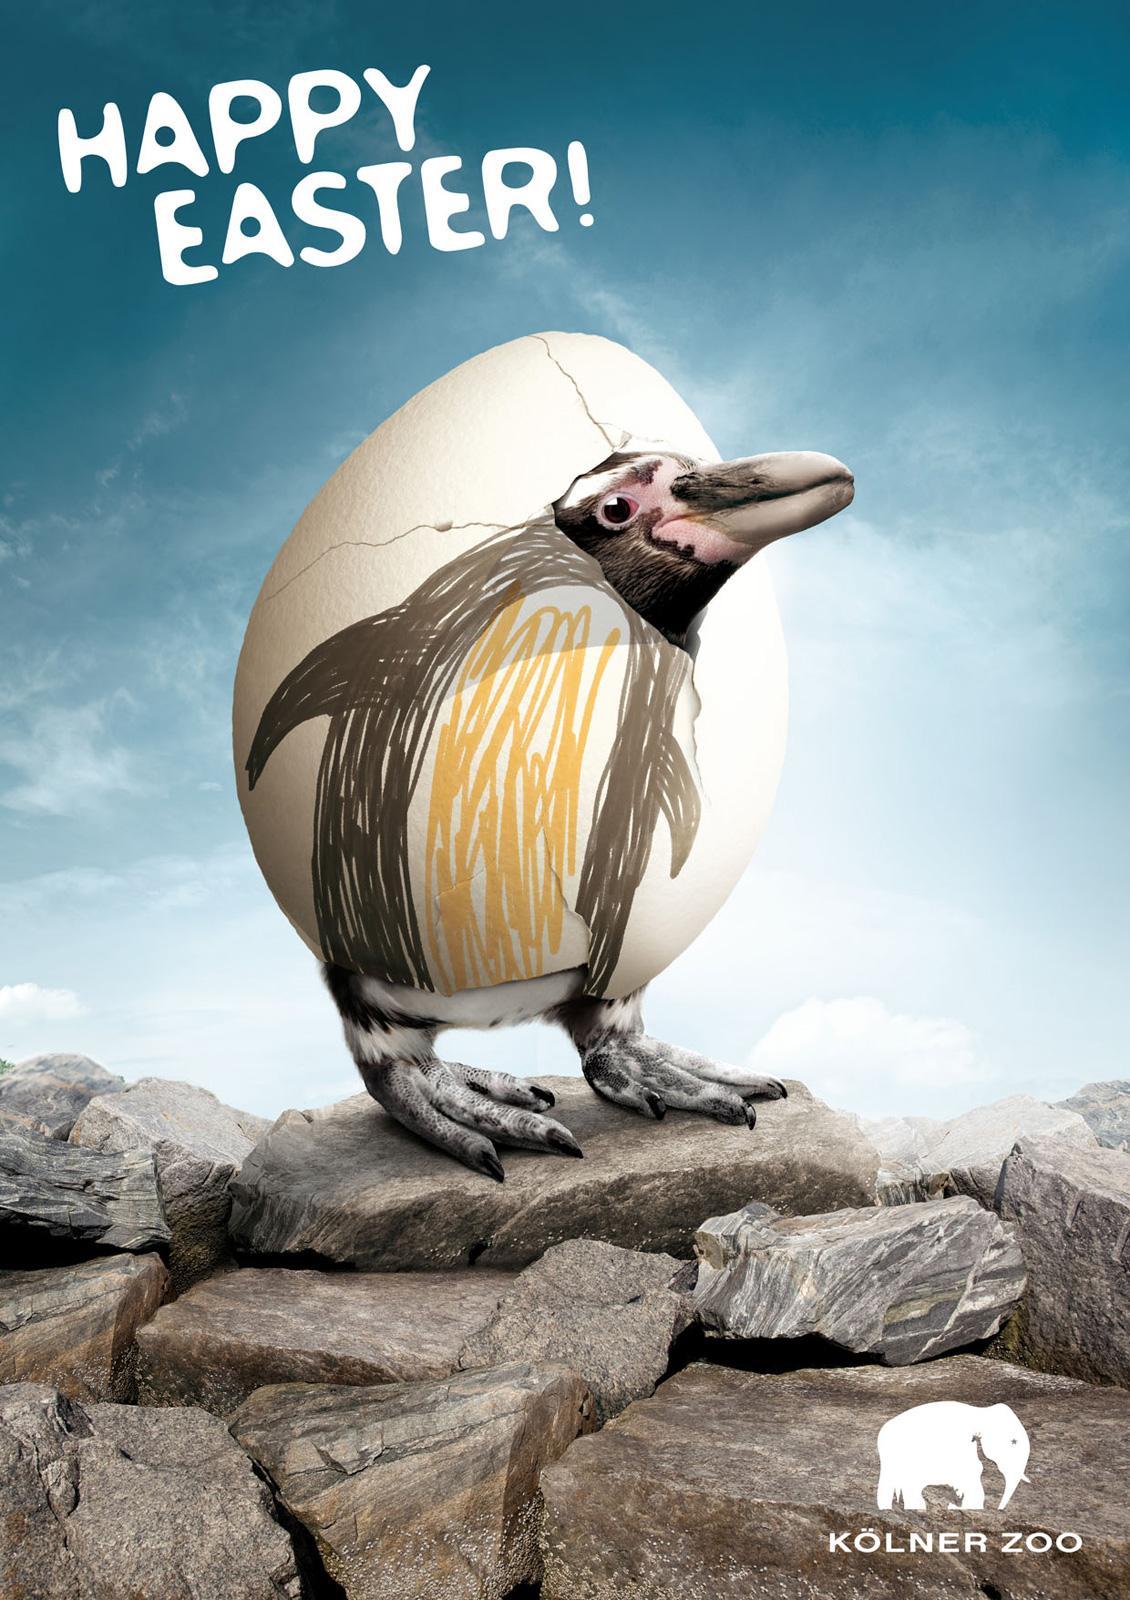 Kölner Zoo Print Ad -  Happy Easter Eggs, Penguin